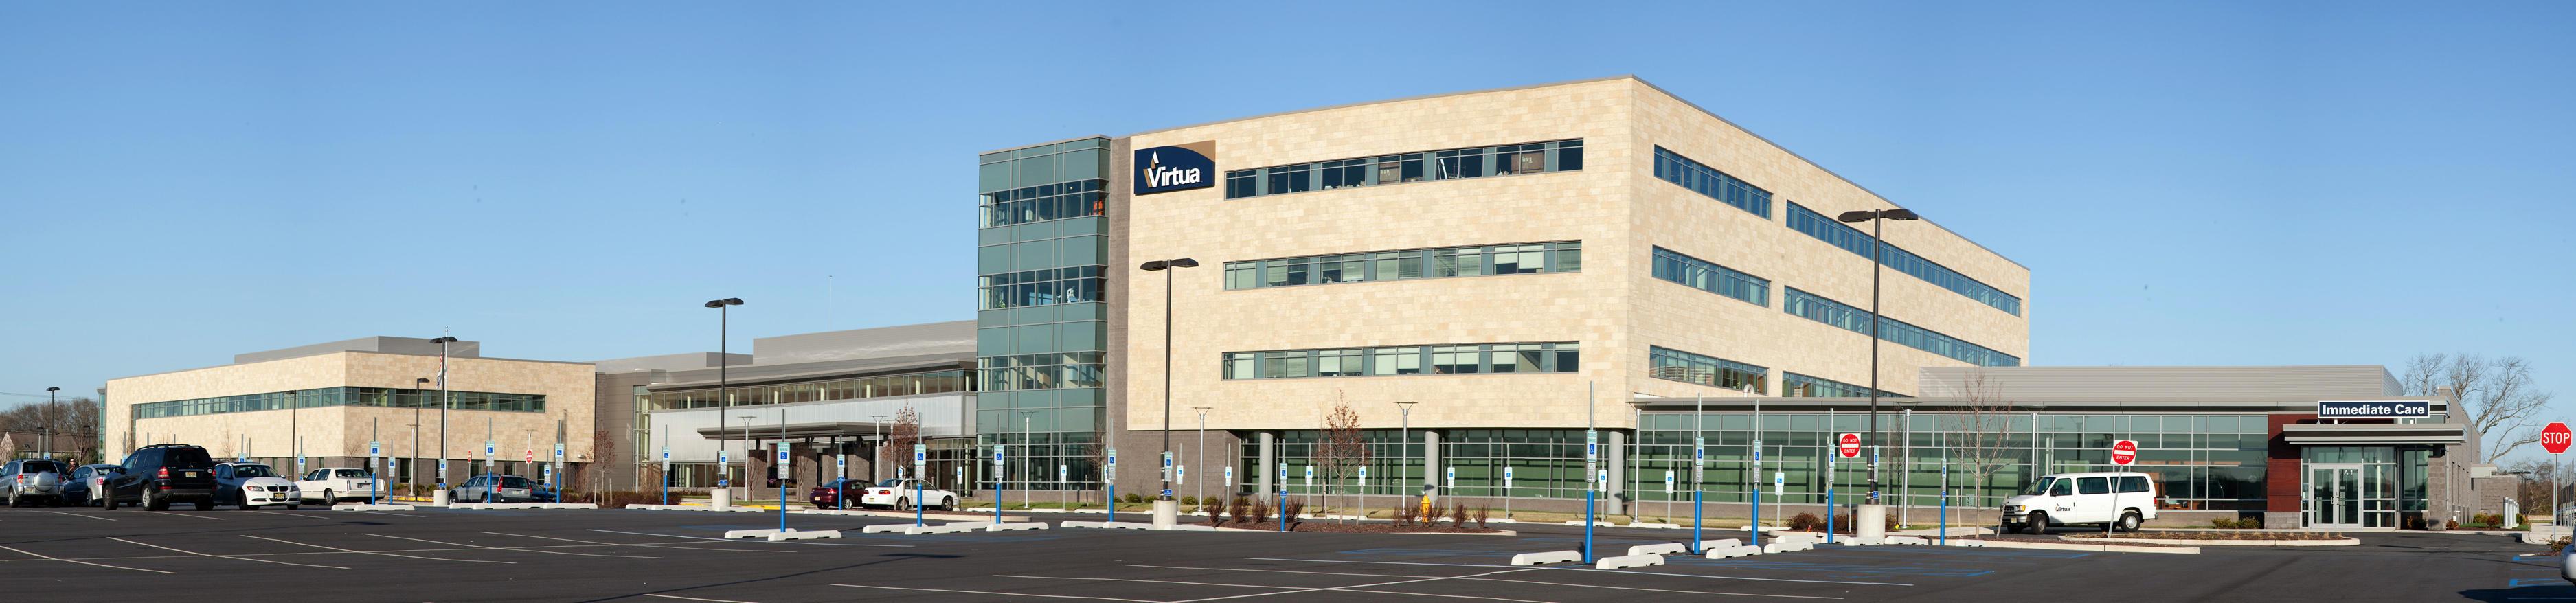 Virtua Center for HealthFitness - CLOSED image 0